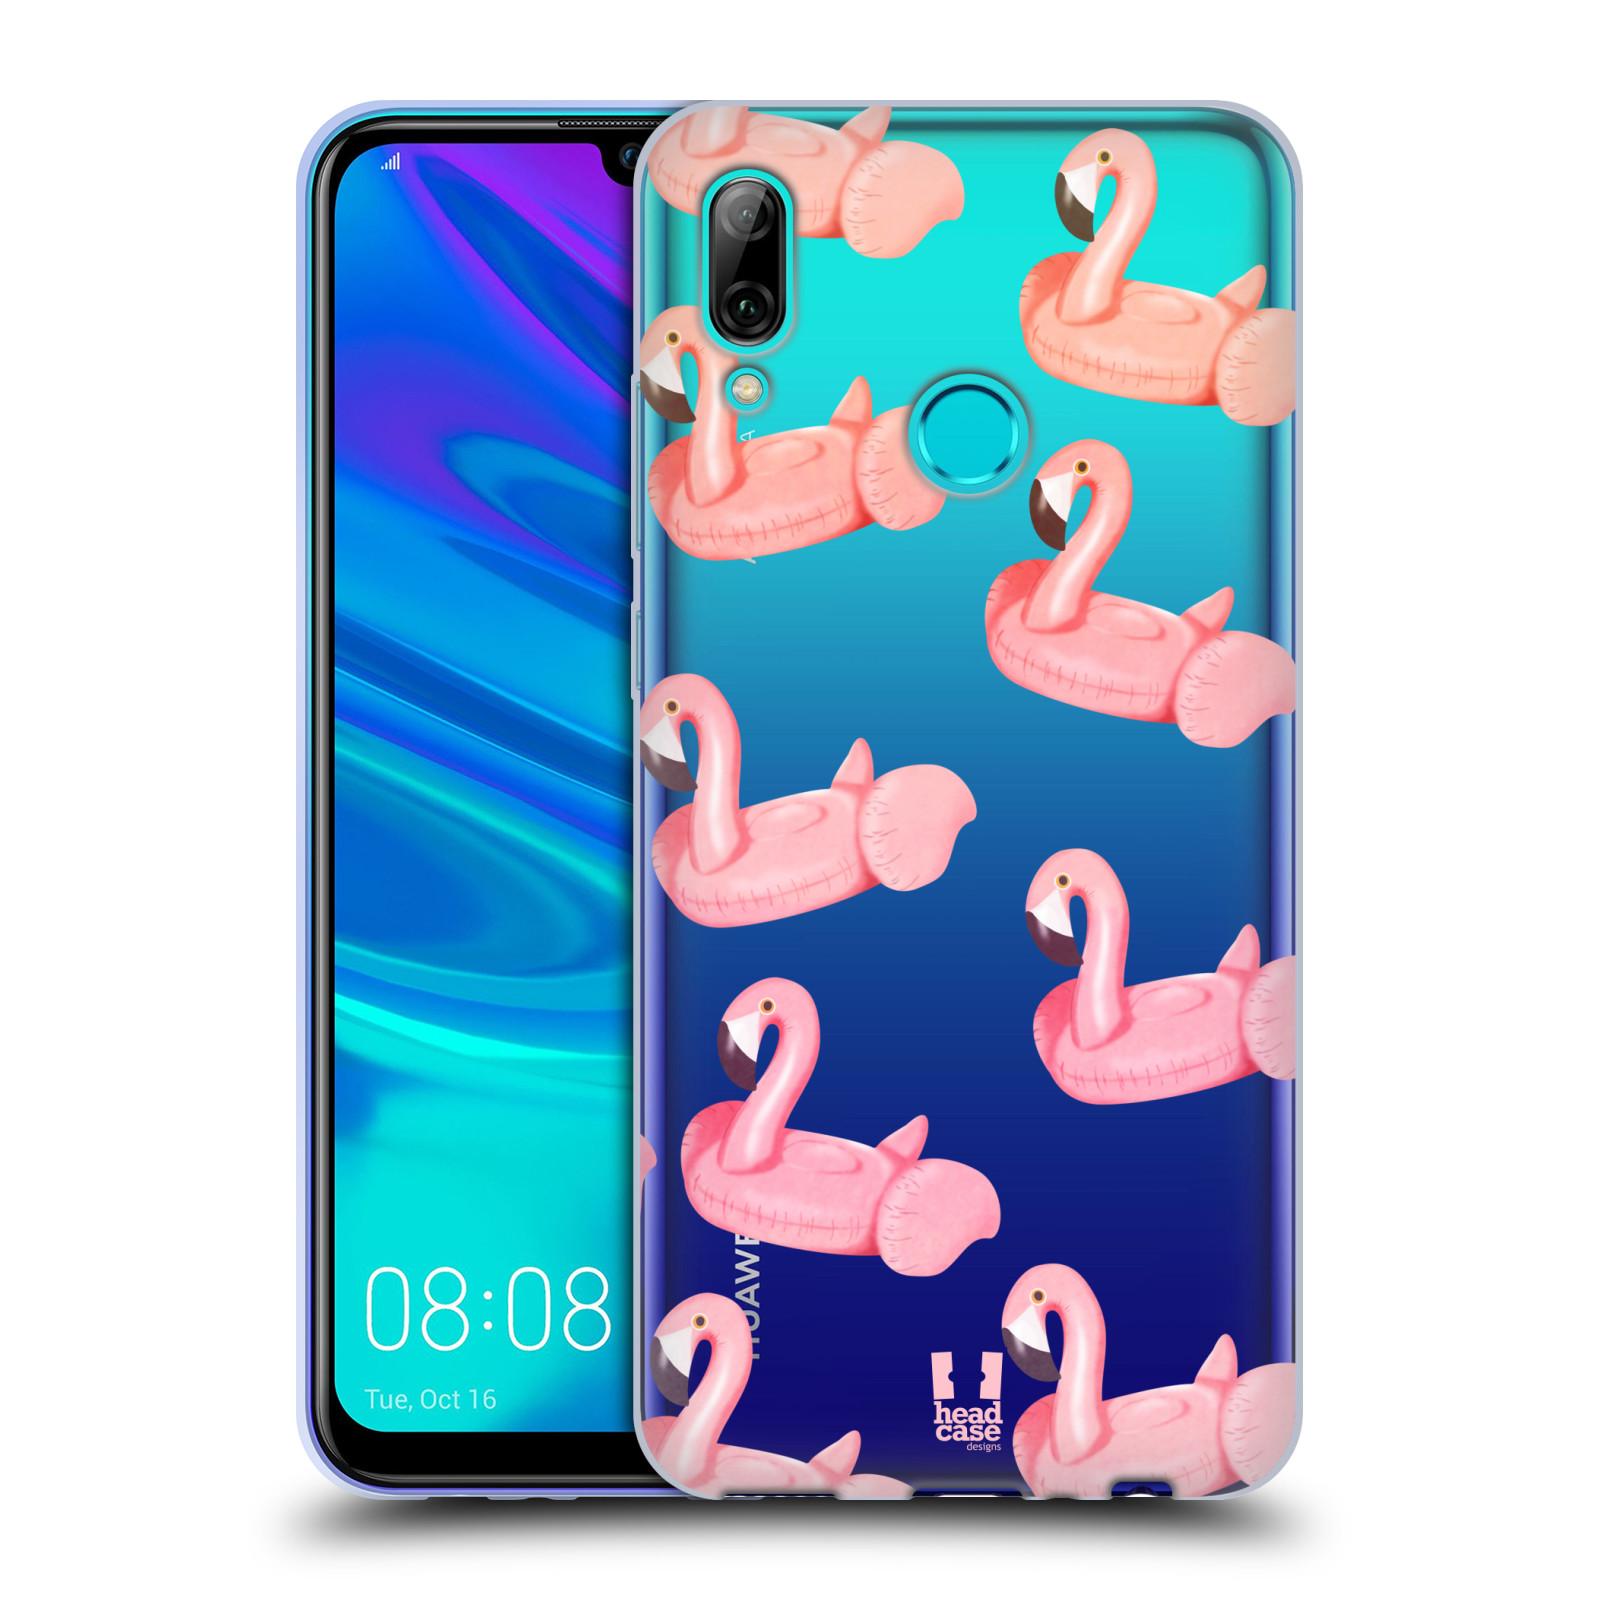 Silikonové pouzdro na mobil Huawei P Smart (2019) - Head Case - Kruh plaměňák